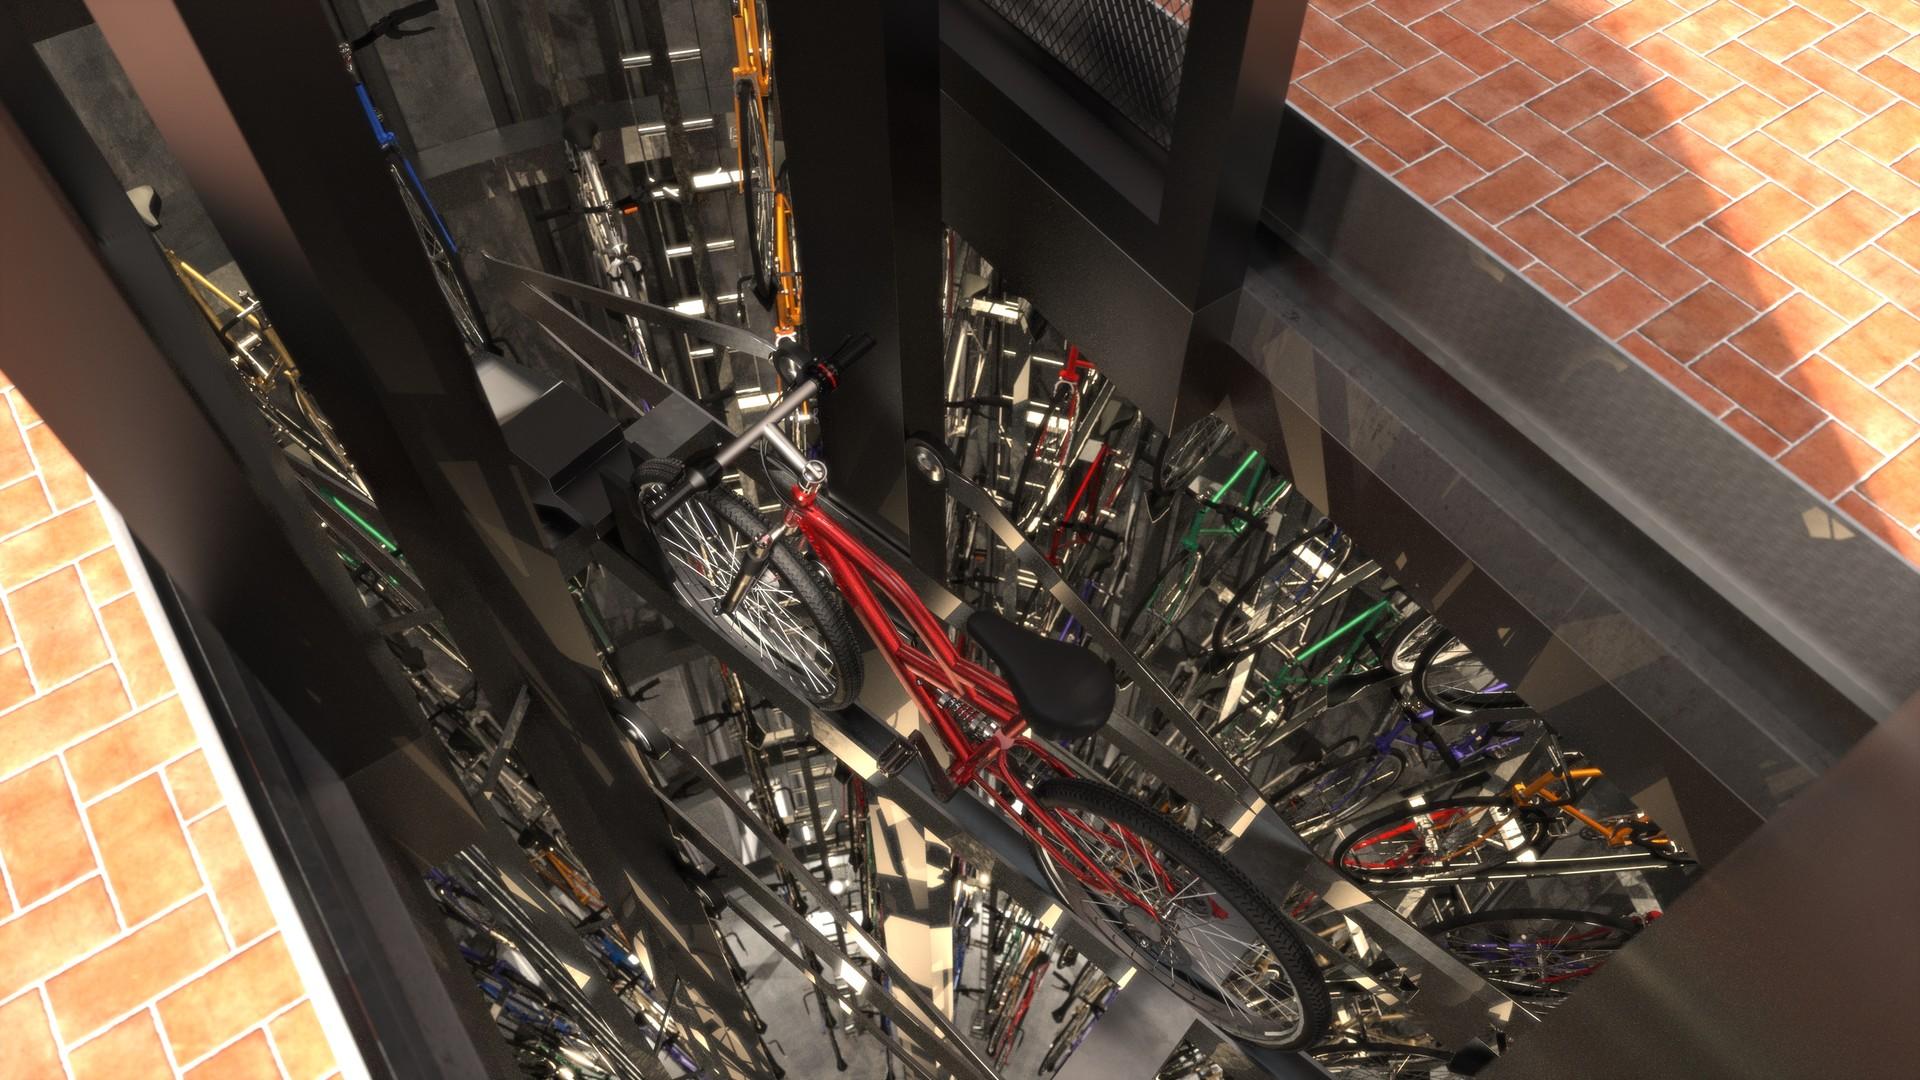 Duane kemp 08 eco cycle build 2017 scene 9 3413x192016 9 2h08m 1024 s px 02